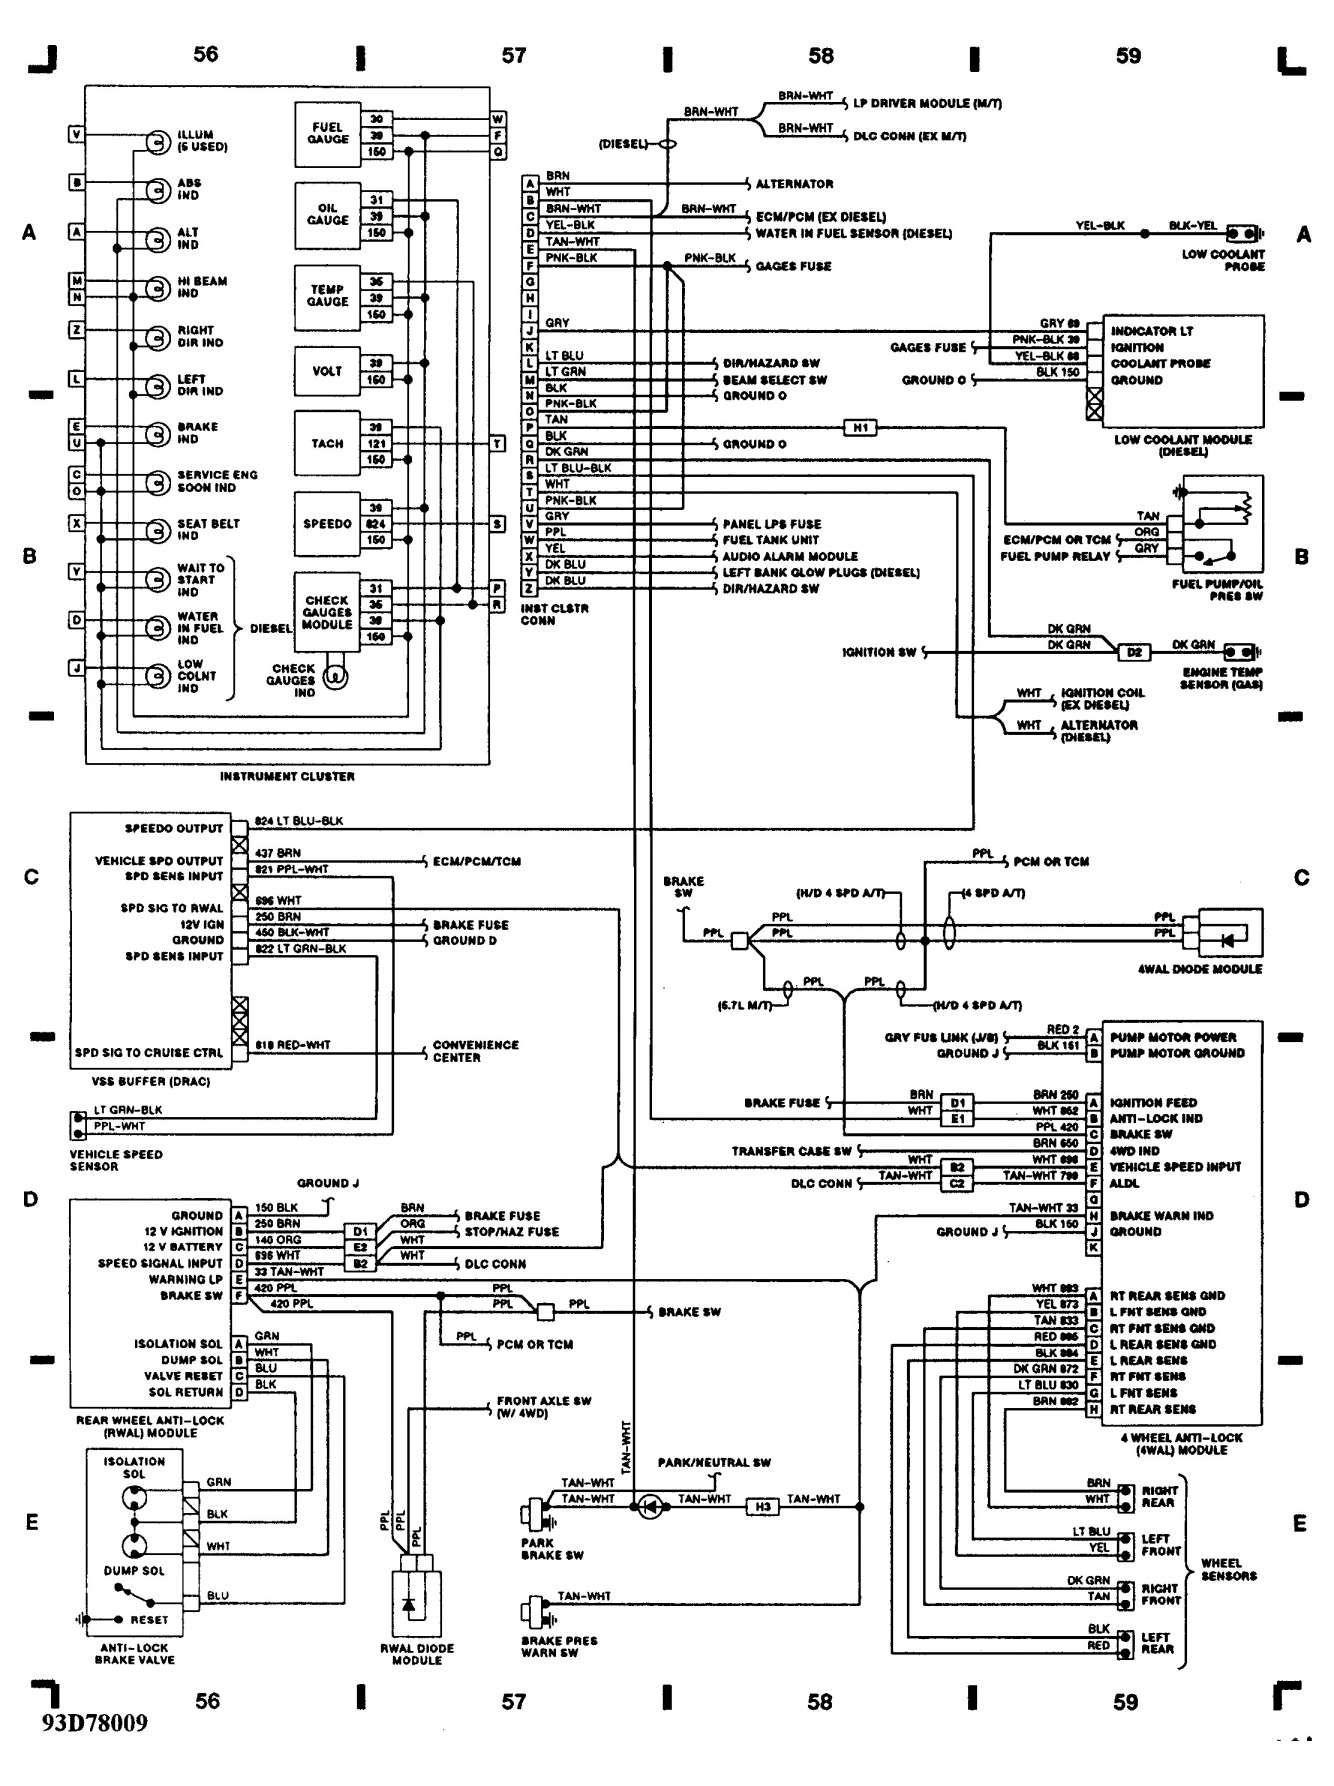 12 3126 Cat Engine Ecm Wiring Diagram Engine Diagram Wiringg Net Diagram 1993 Chevy Silverado Chevy Trucks